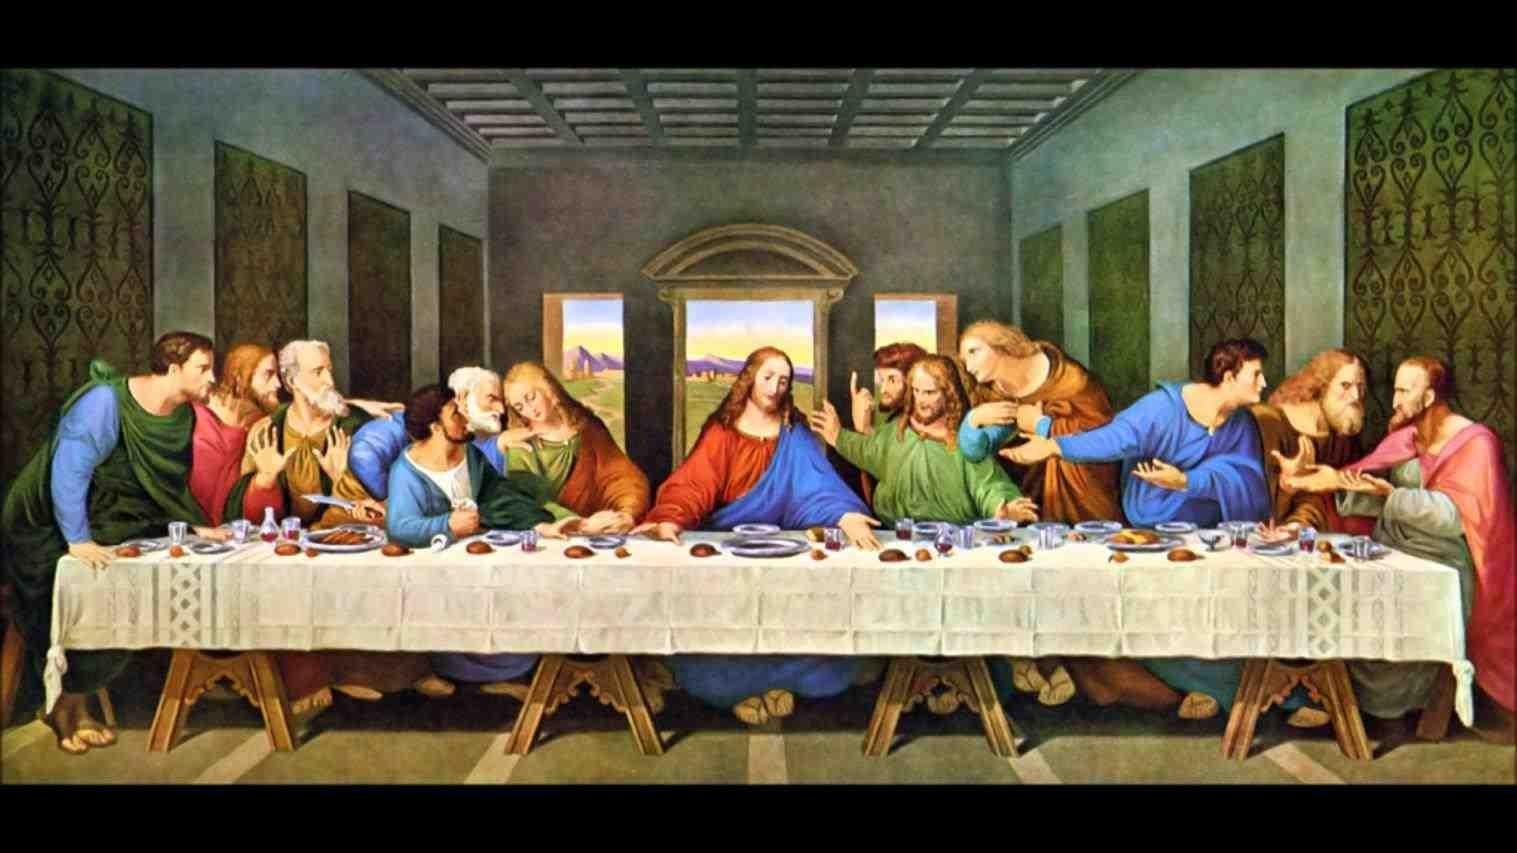 the last supper original paintingleonardo da vinci wallpaper